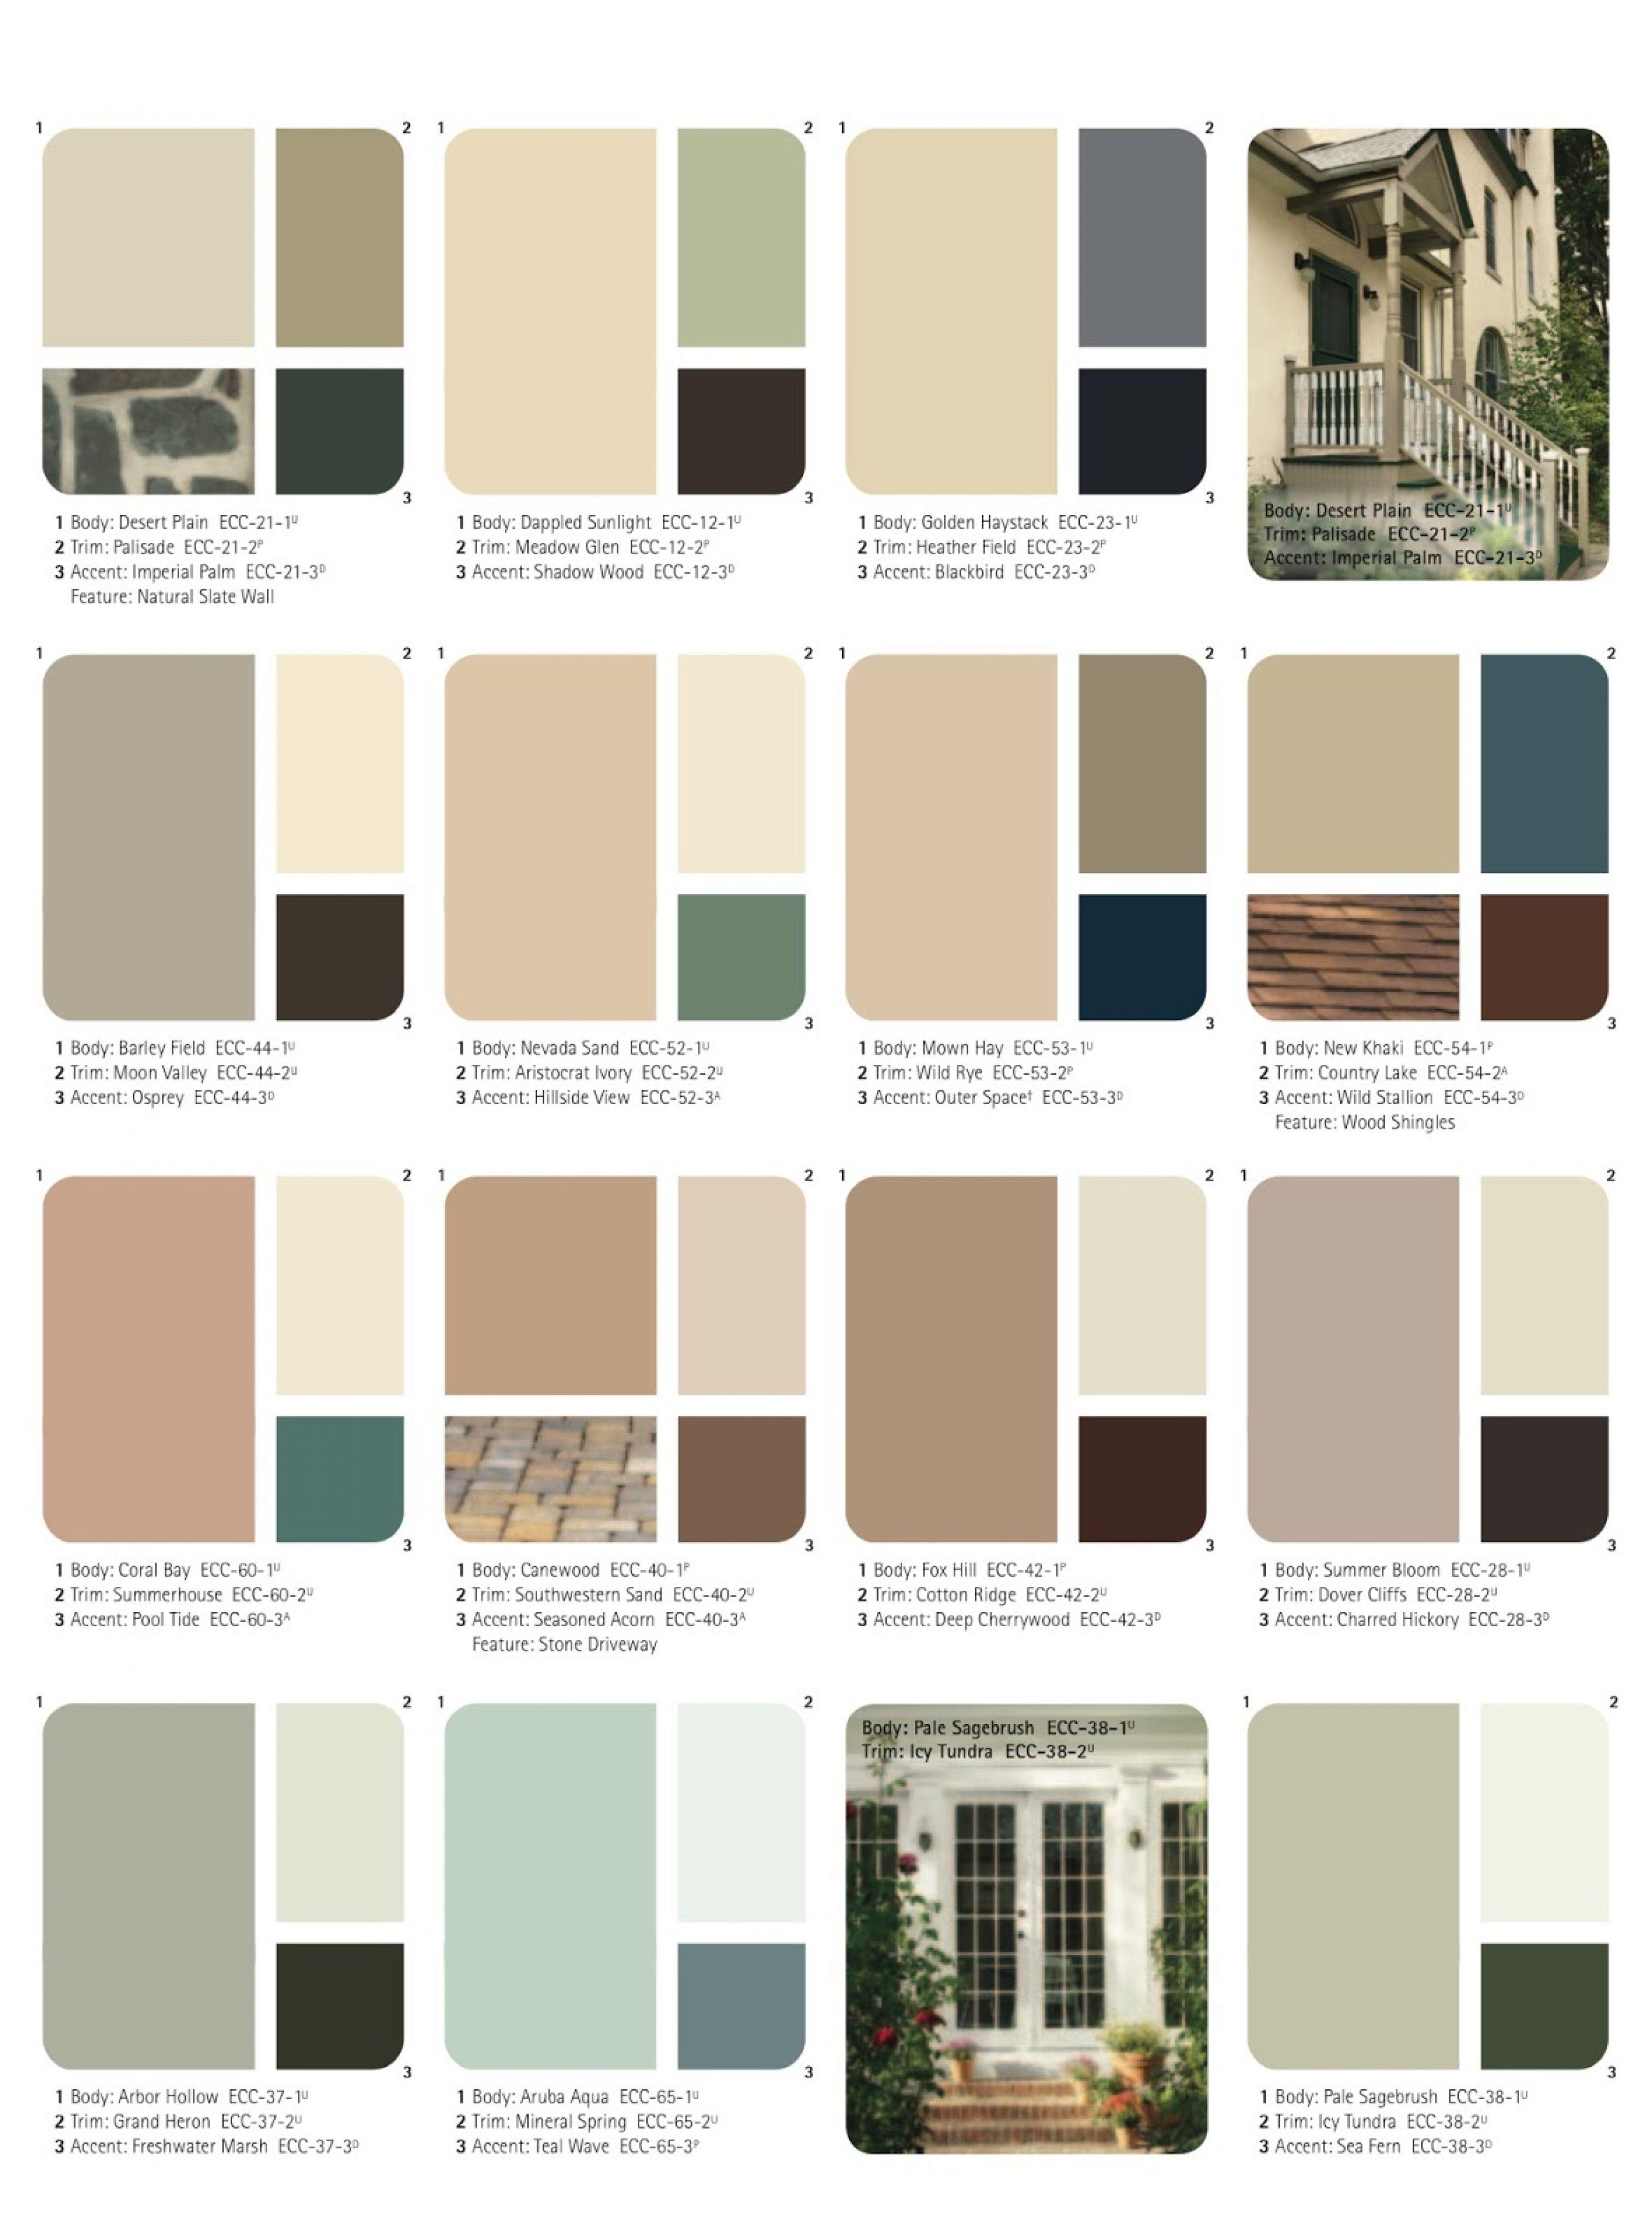 Home Depot Paint Color Ideas - interior paint colors for 2017 Check ...